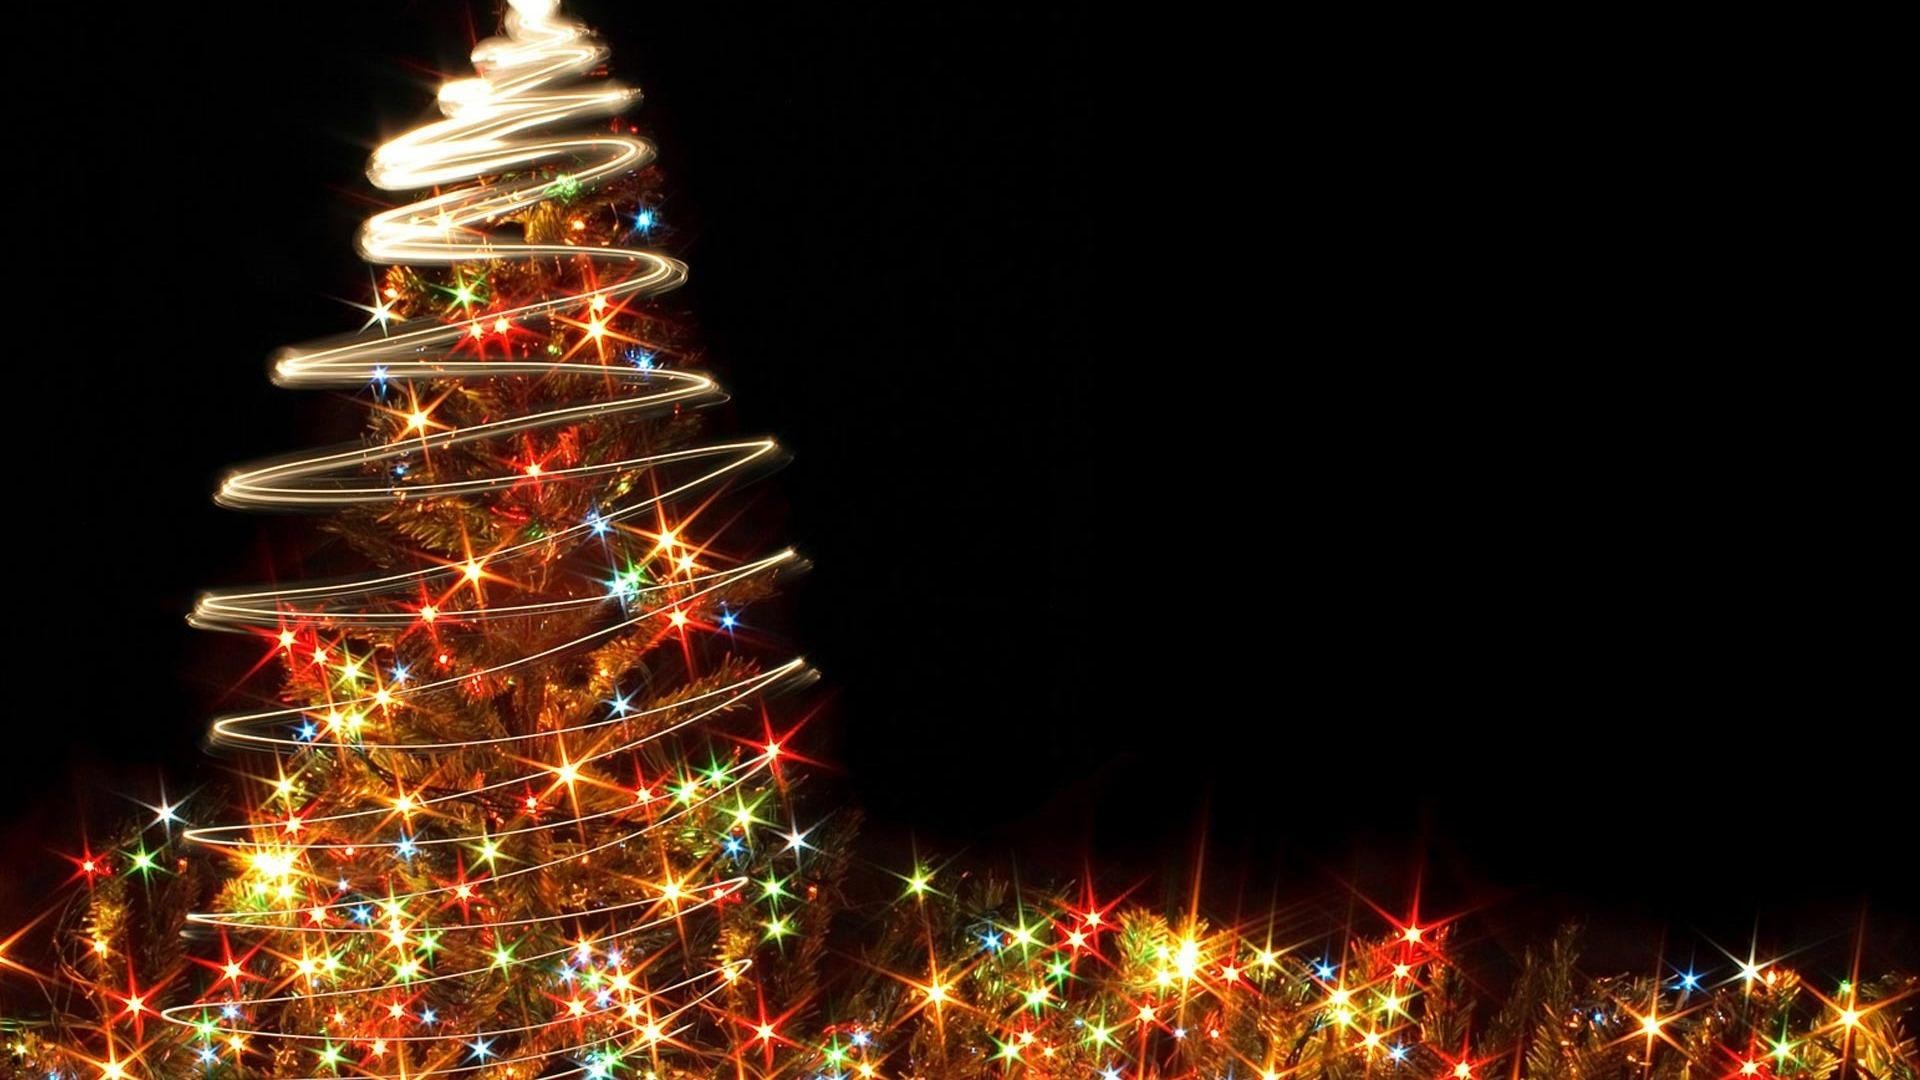 Animated Christmas Desktop Widescreen HD Wallpaper